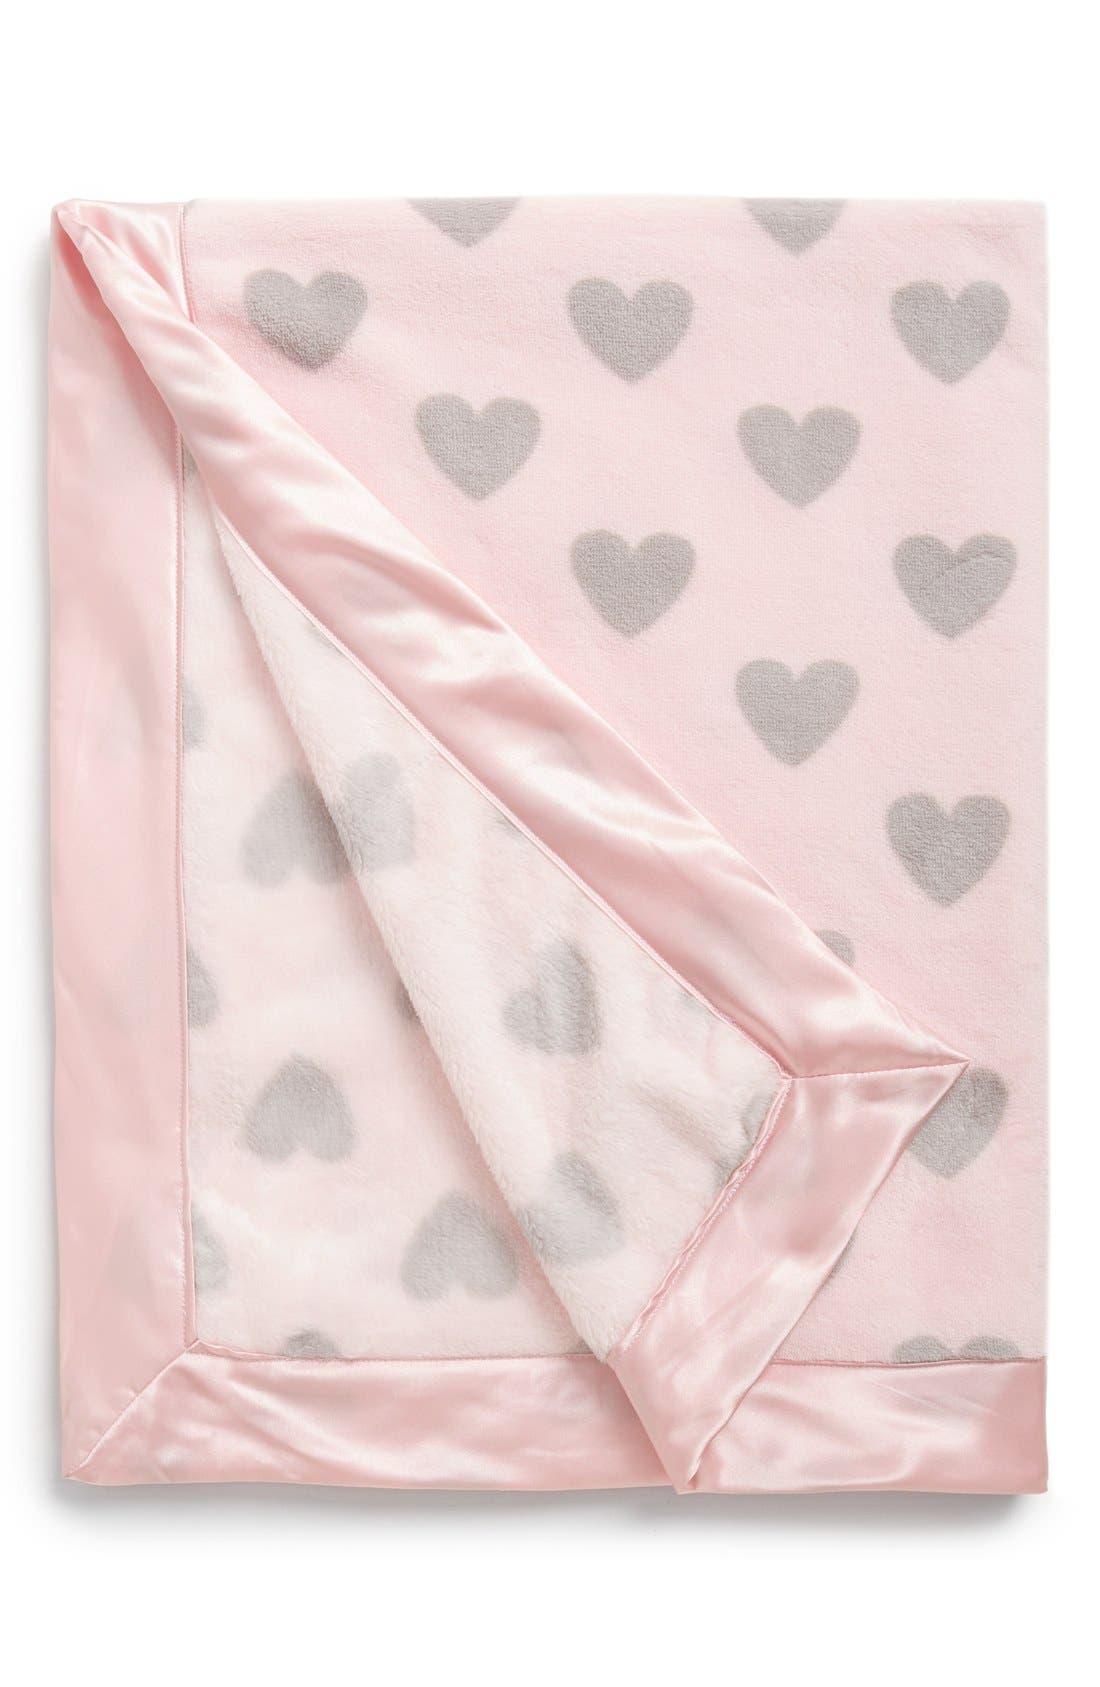 Main Image - Nordstrom Baby Print Blanket